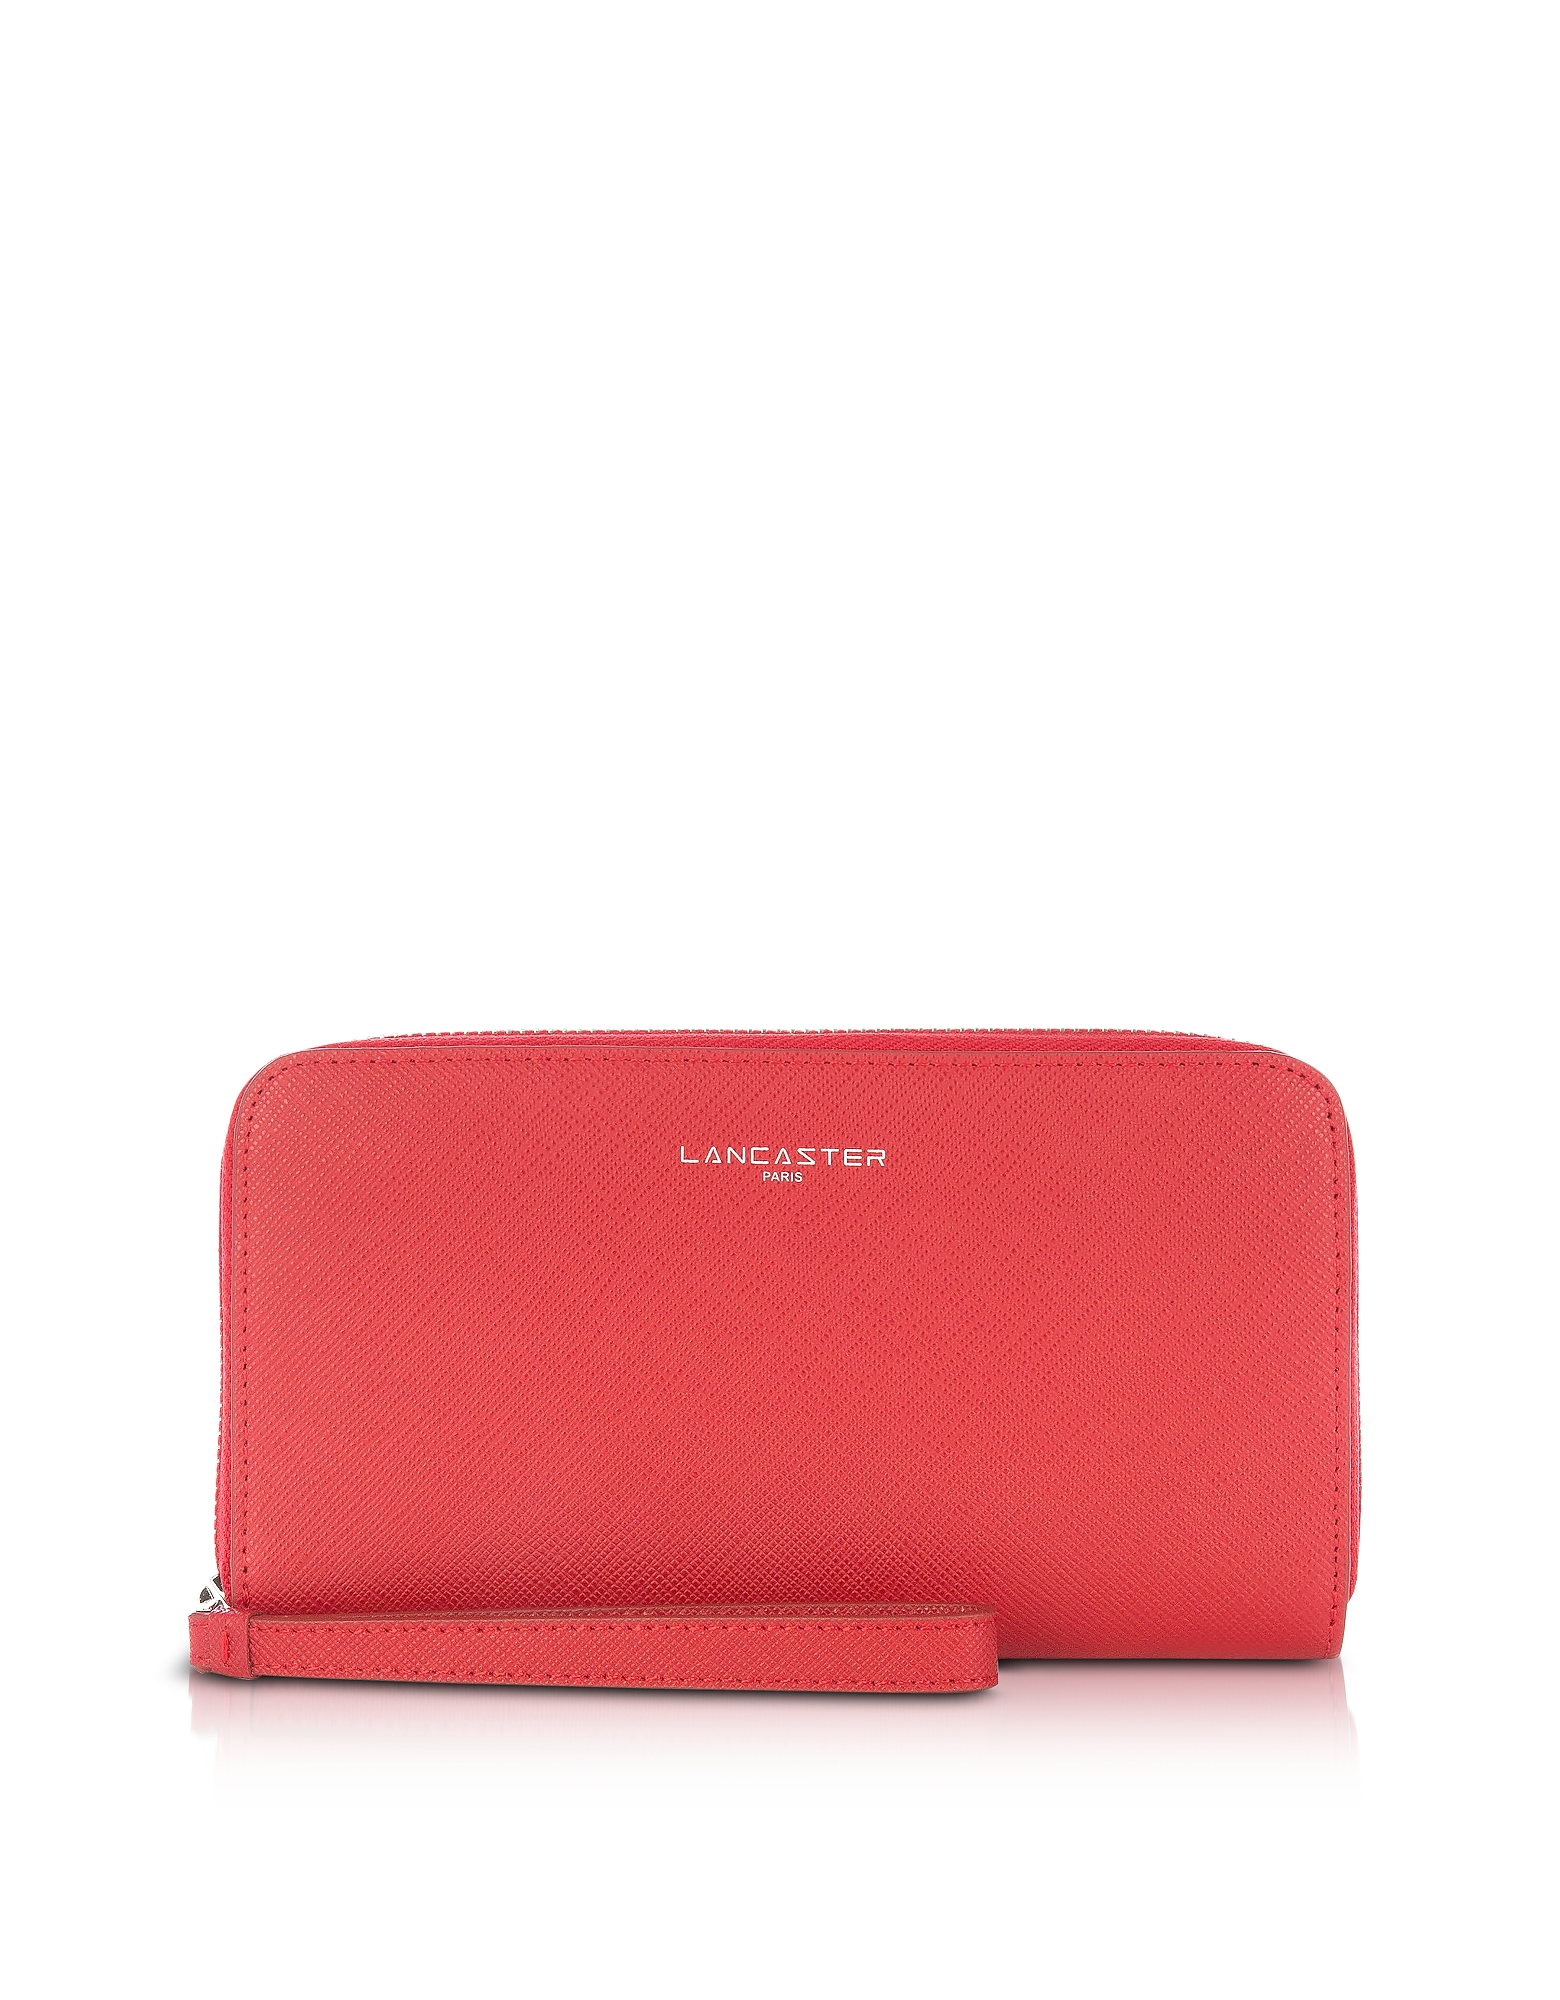 Lancaster Paris Handbags, Adele Zip Around Continental Wallet